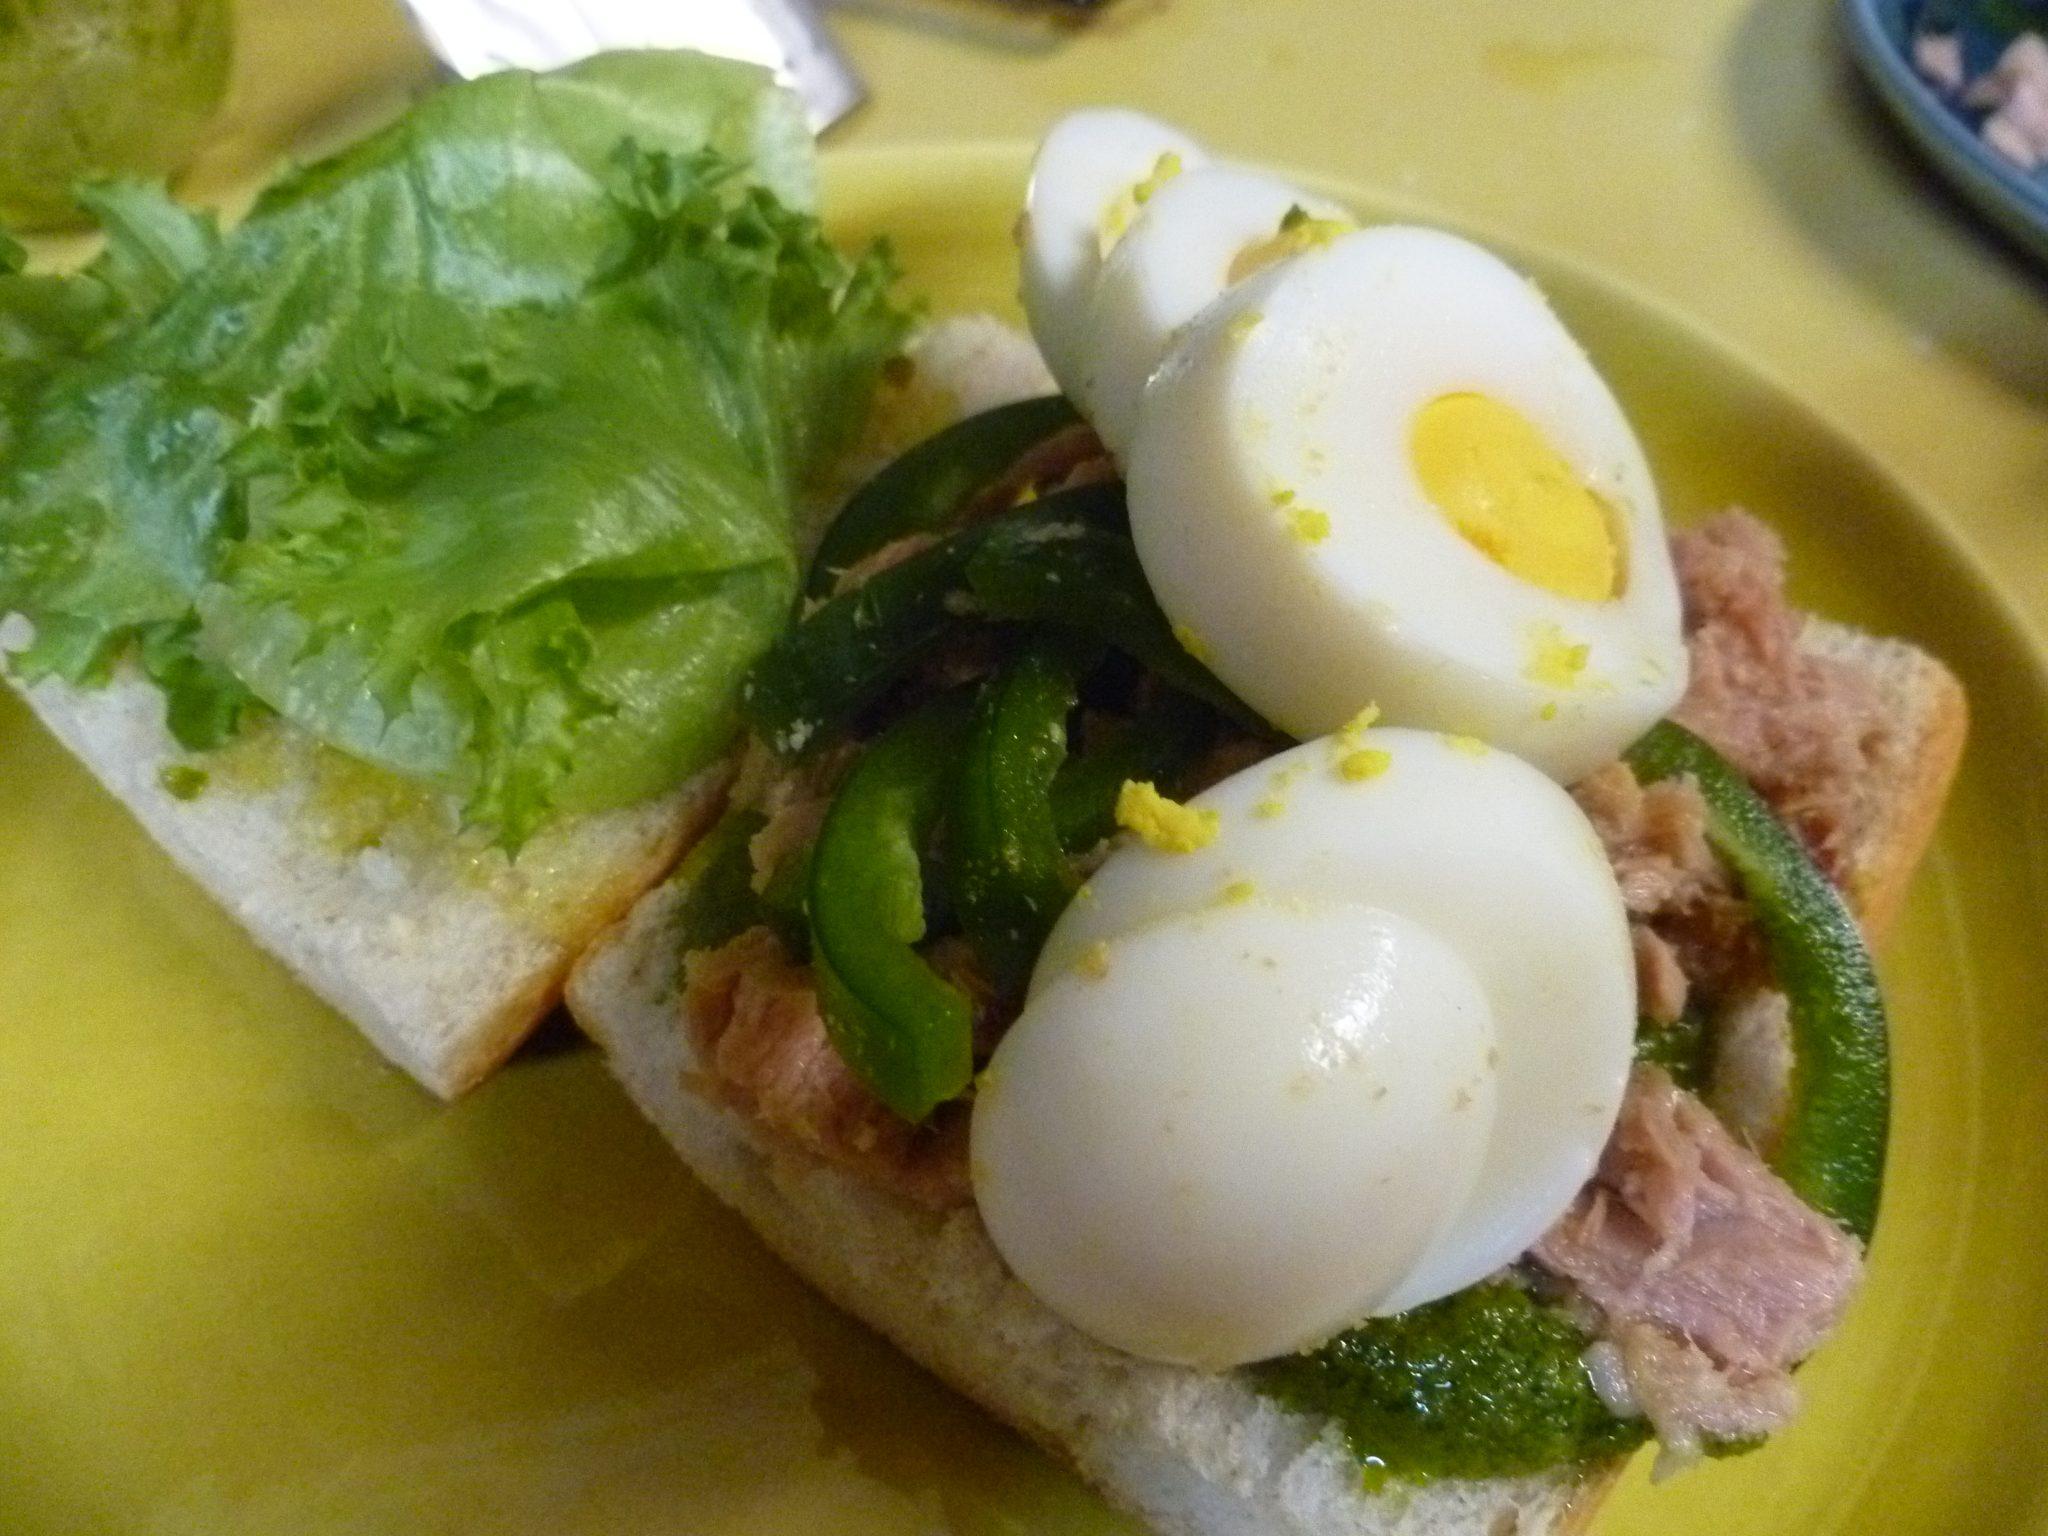 The Ultimate tuna fish sandwich